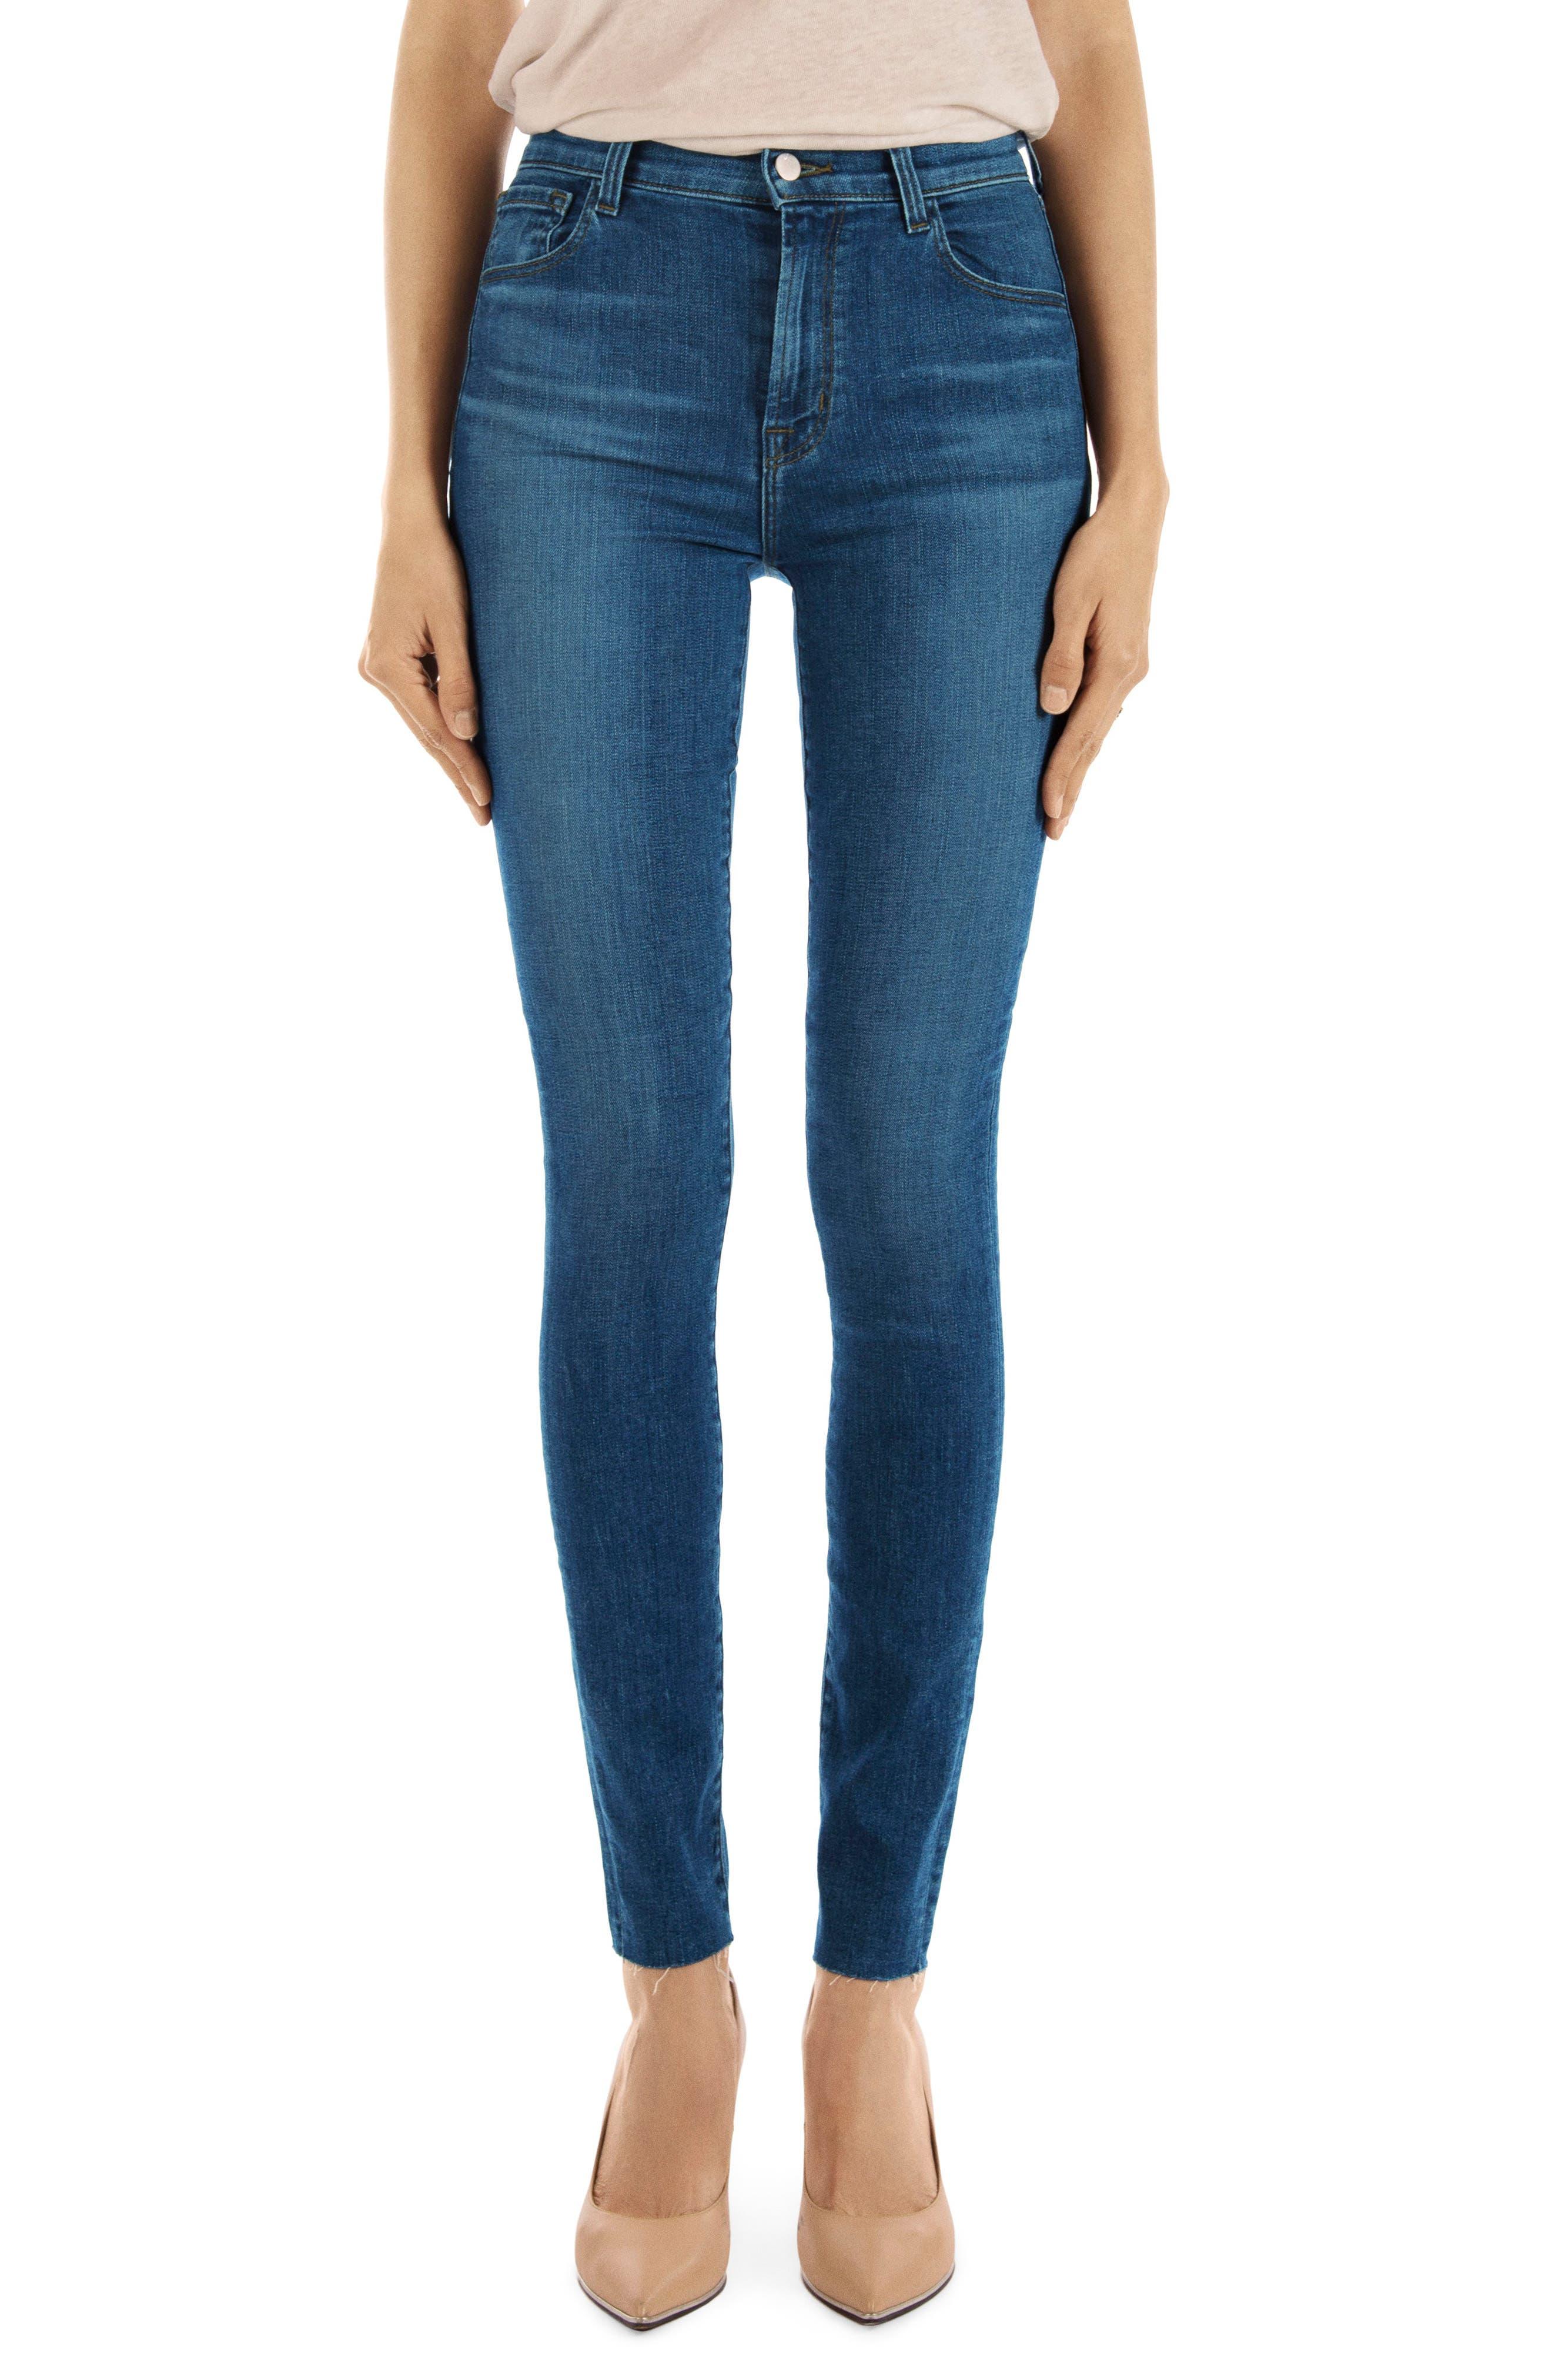 Carolina Super High Waist Skinny Jeans,                             Main thumbnail 1, color,                             LOVESICK